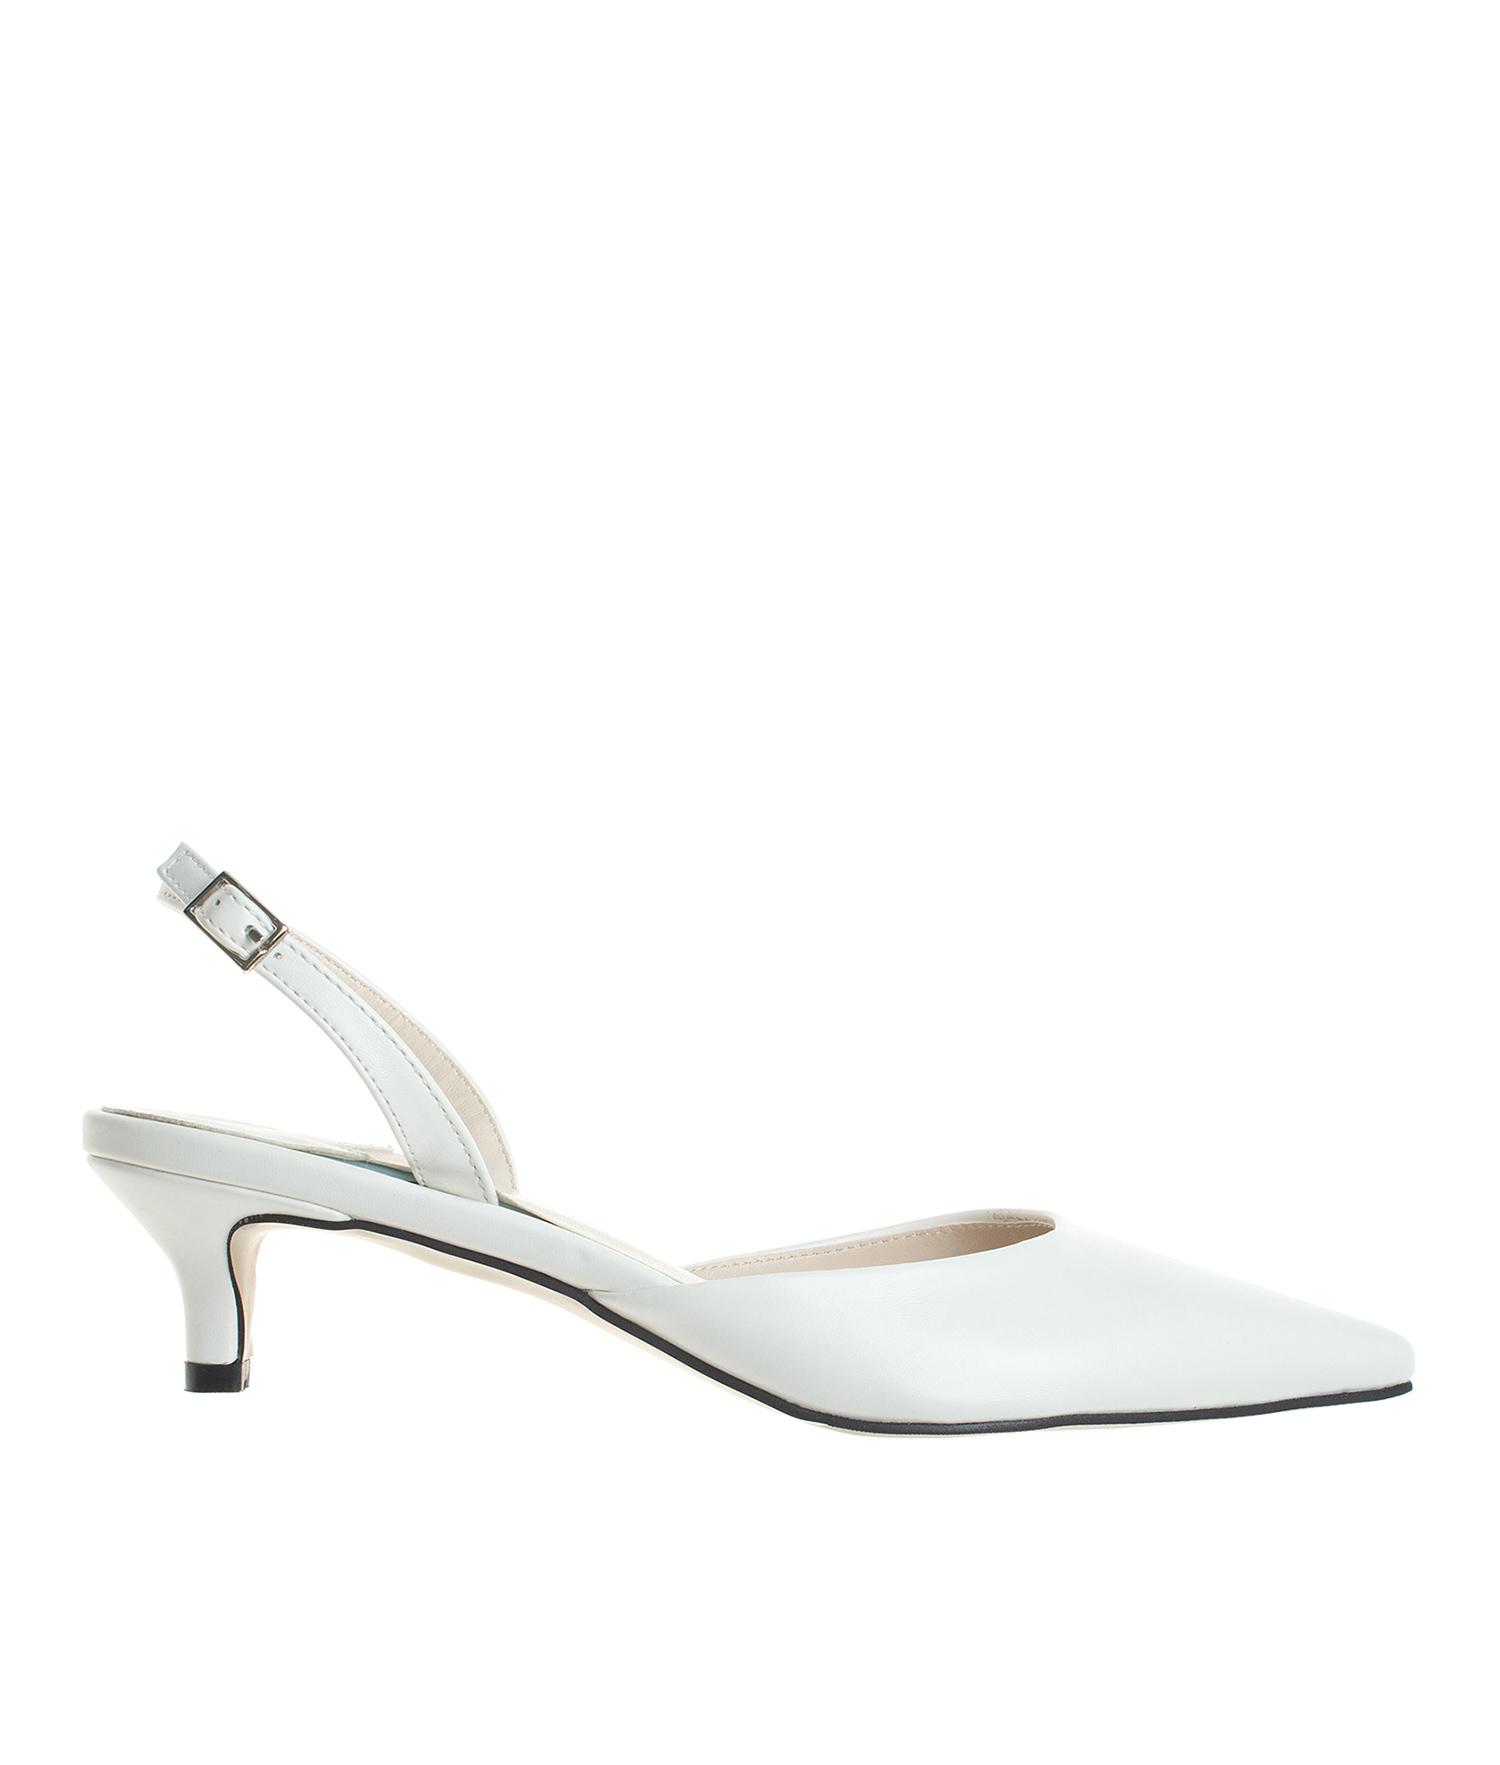 AnnaKastle Womens Pointed Toe Kitten Heel Slingback Pumps Dress Shoes White